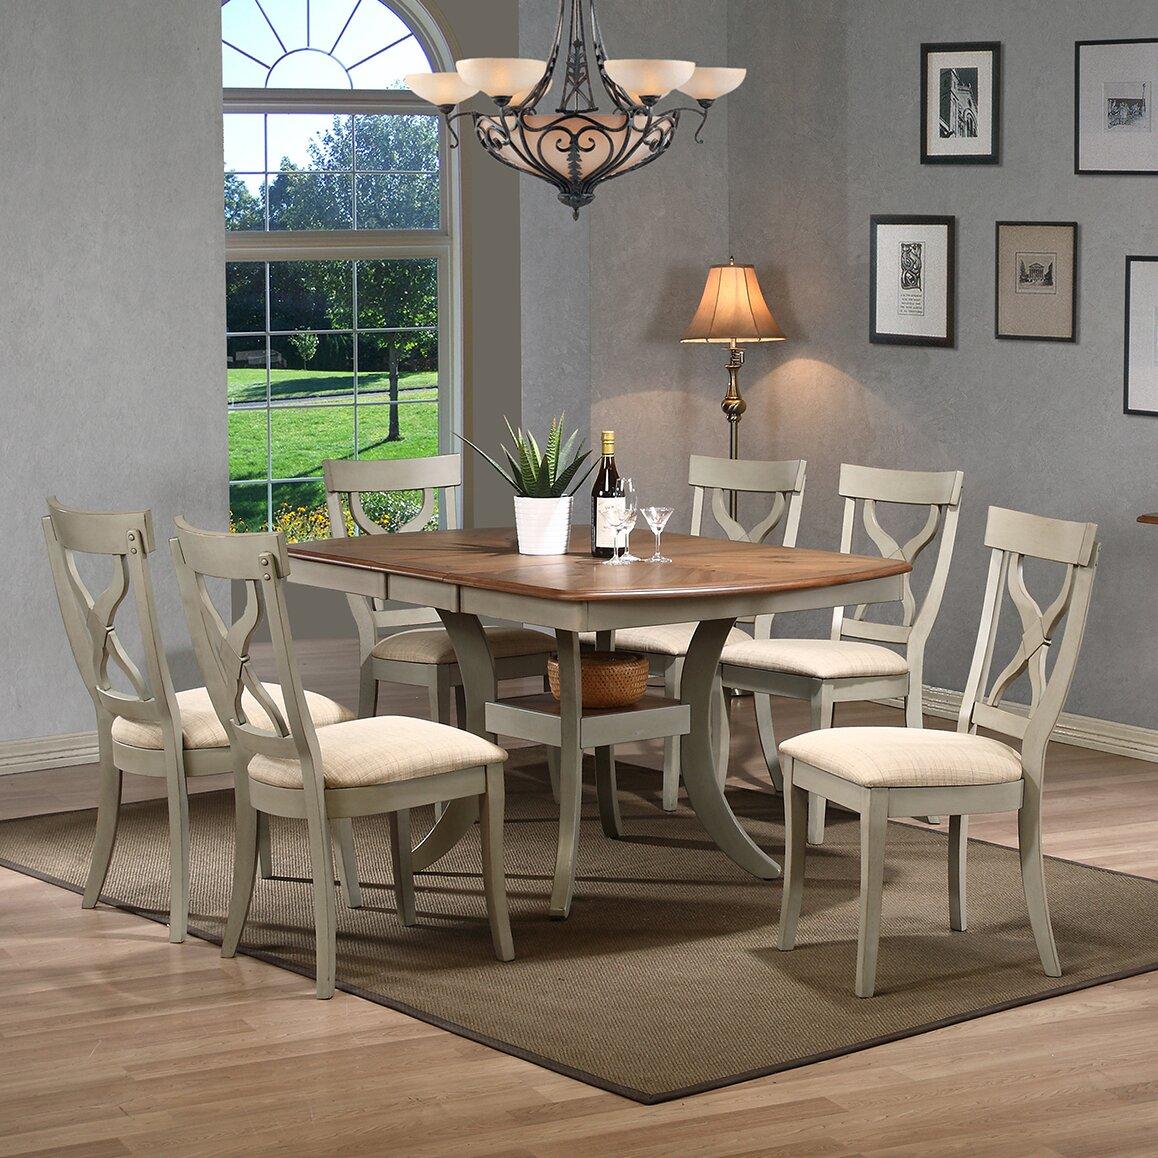 wholesale interiors baxton studio balmoral 7 piece dining